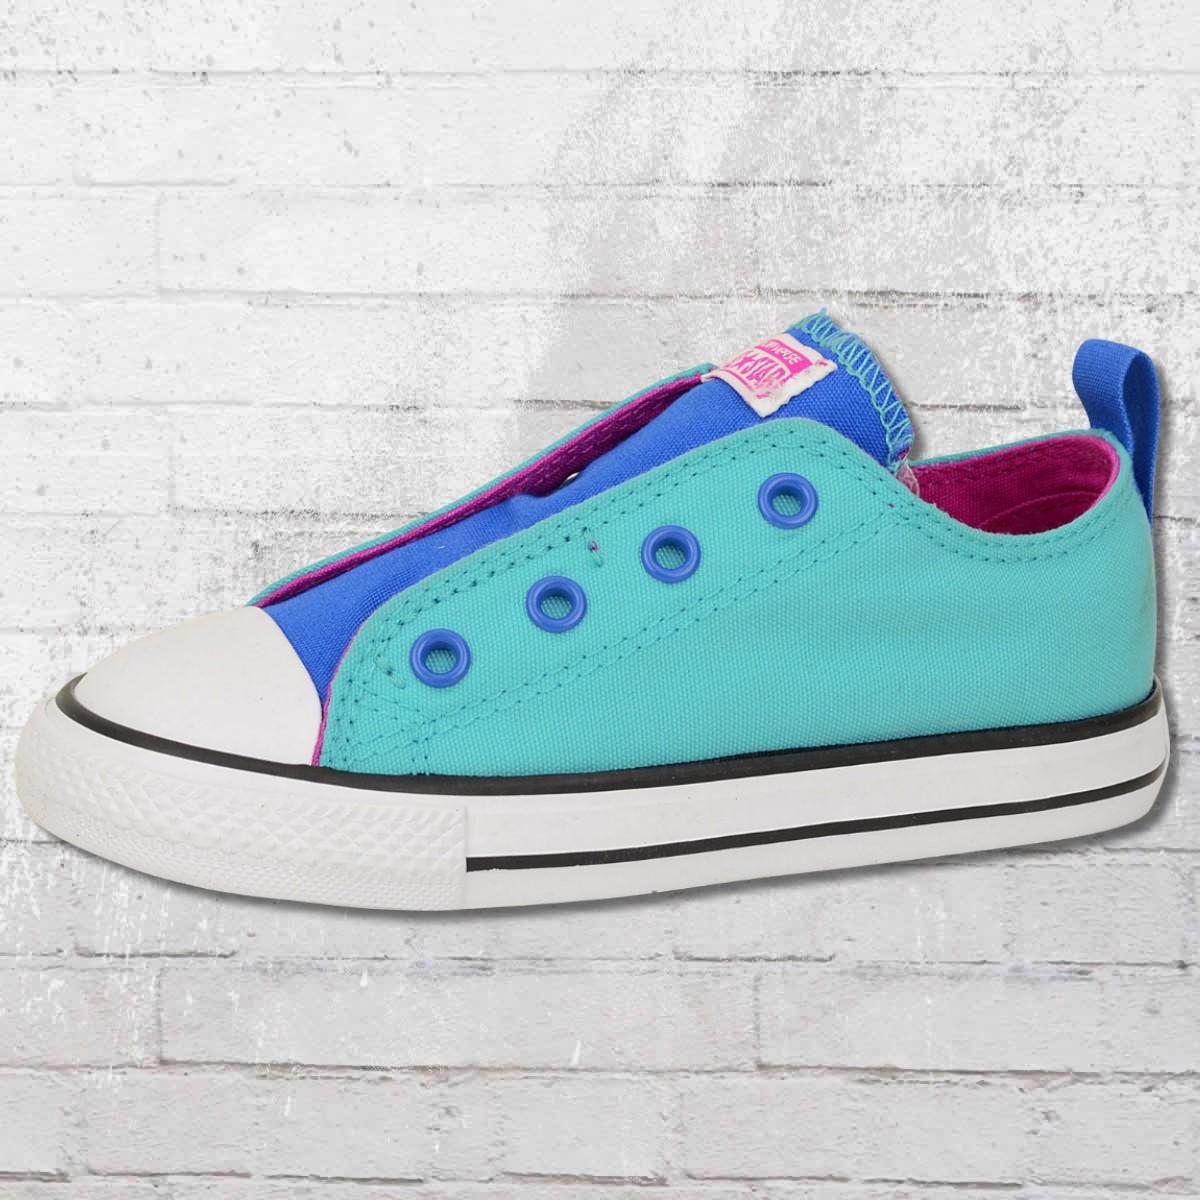 new product 4cad3 74764 Jetzt bestellen | Converse Simple Slip Kinder Schuhe blau ...